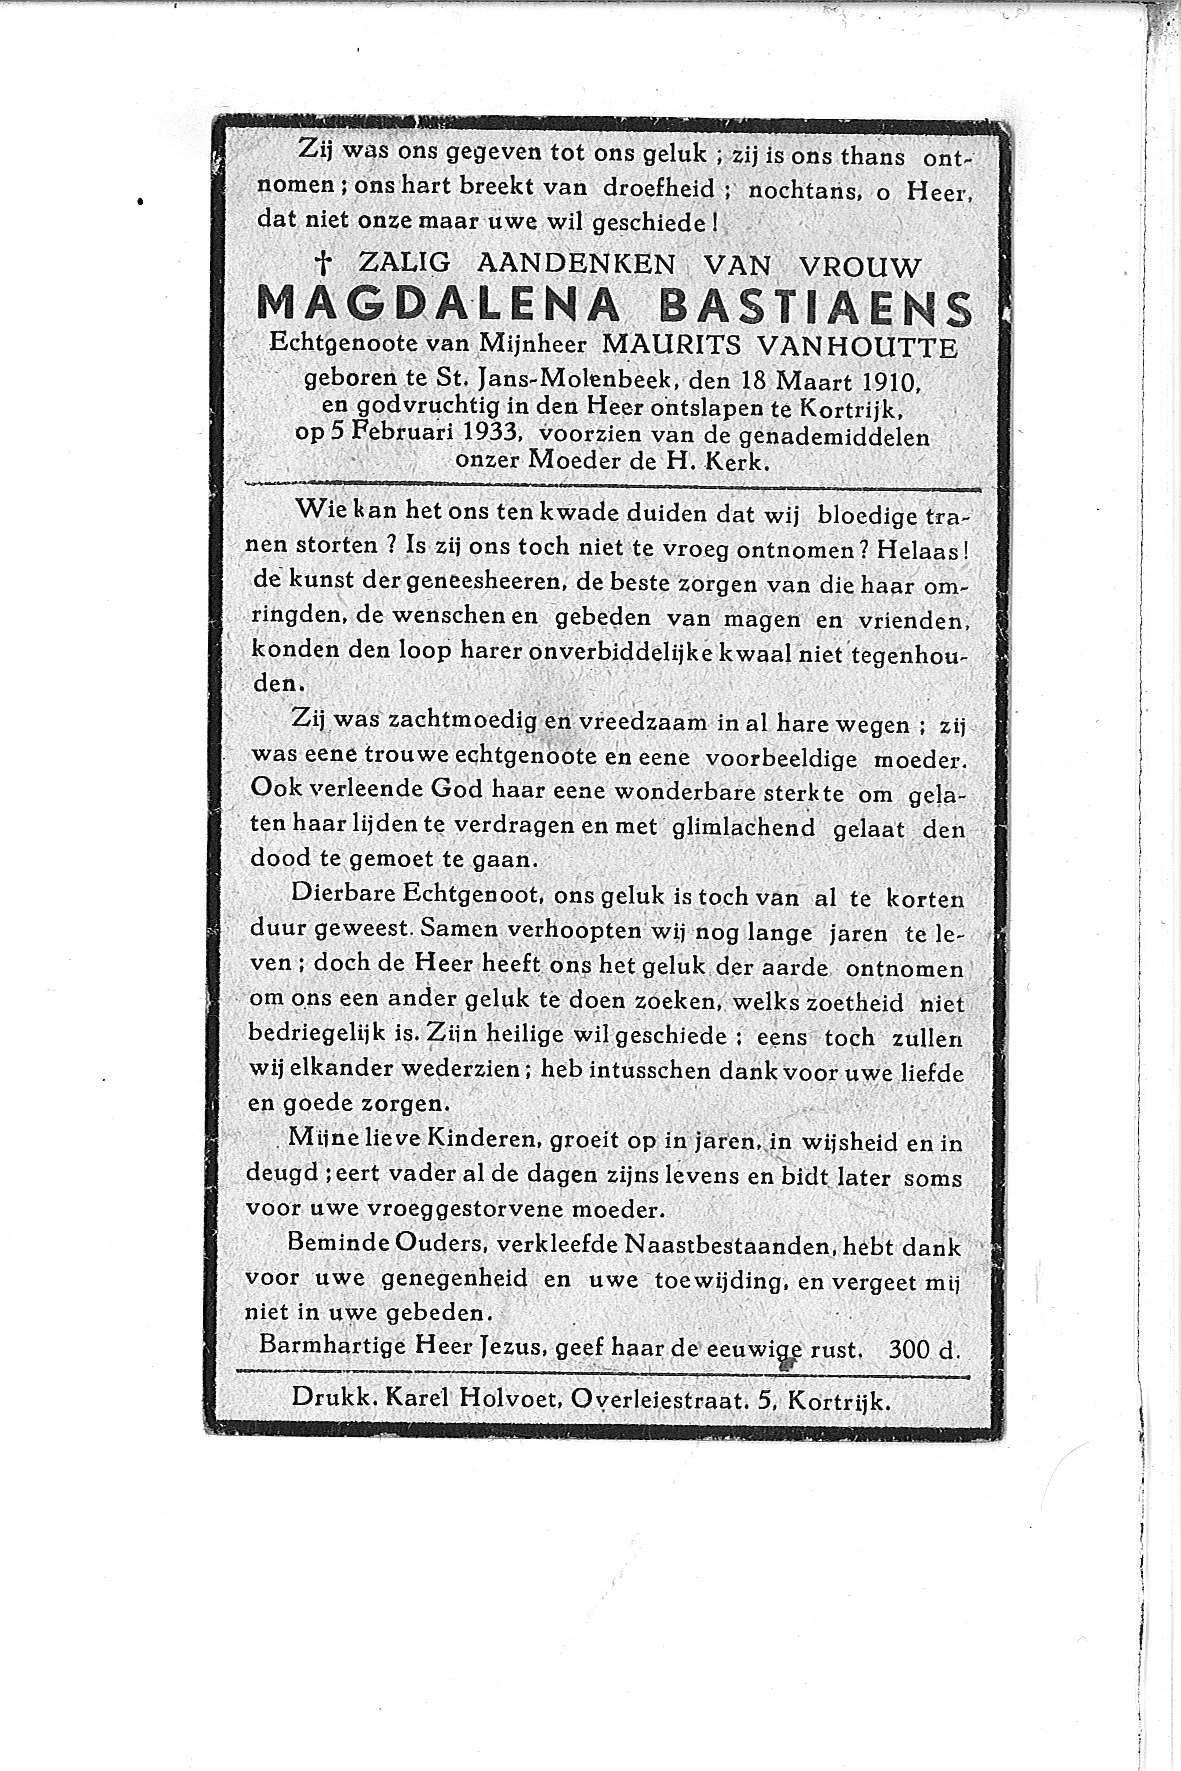 Mgdalena(1910)20101018133802_00012.jpg